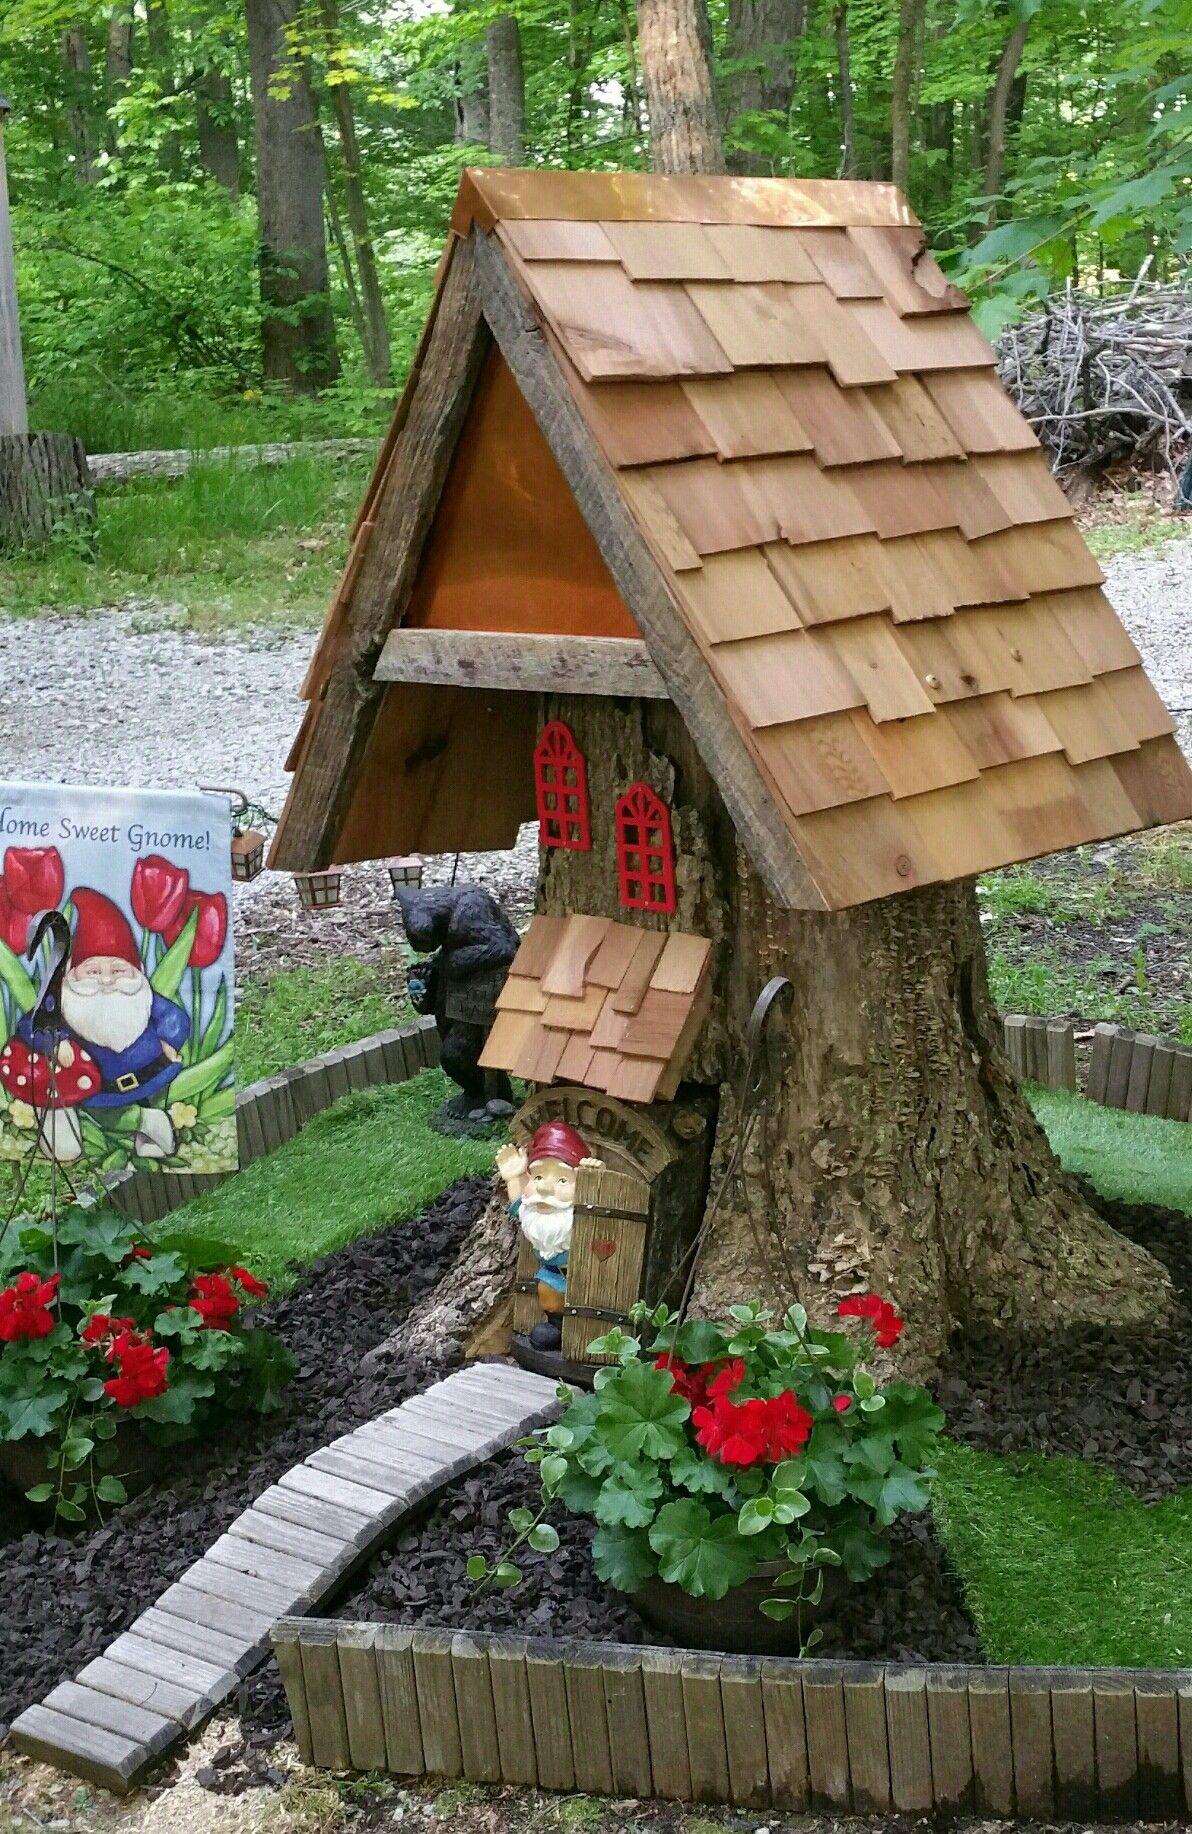 Garden Gnome   Garden Gnome Sweeping with Broom   Gnomes ...